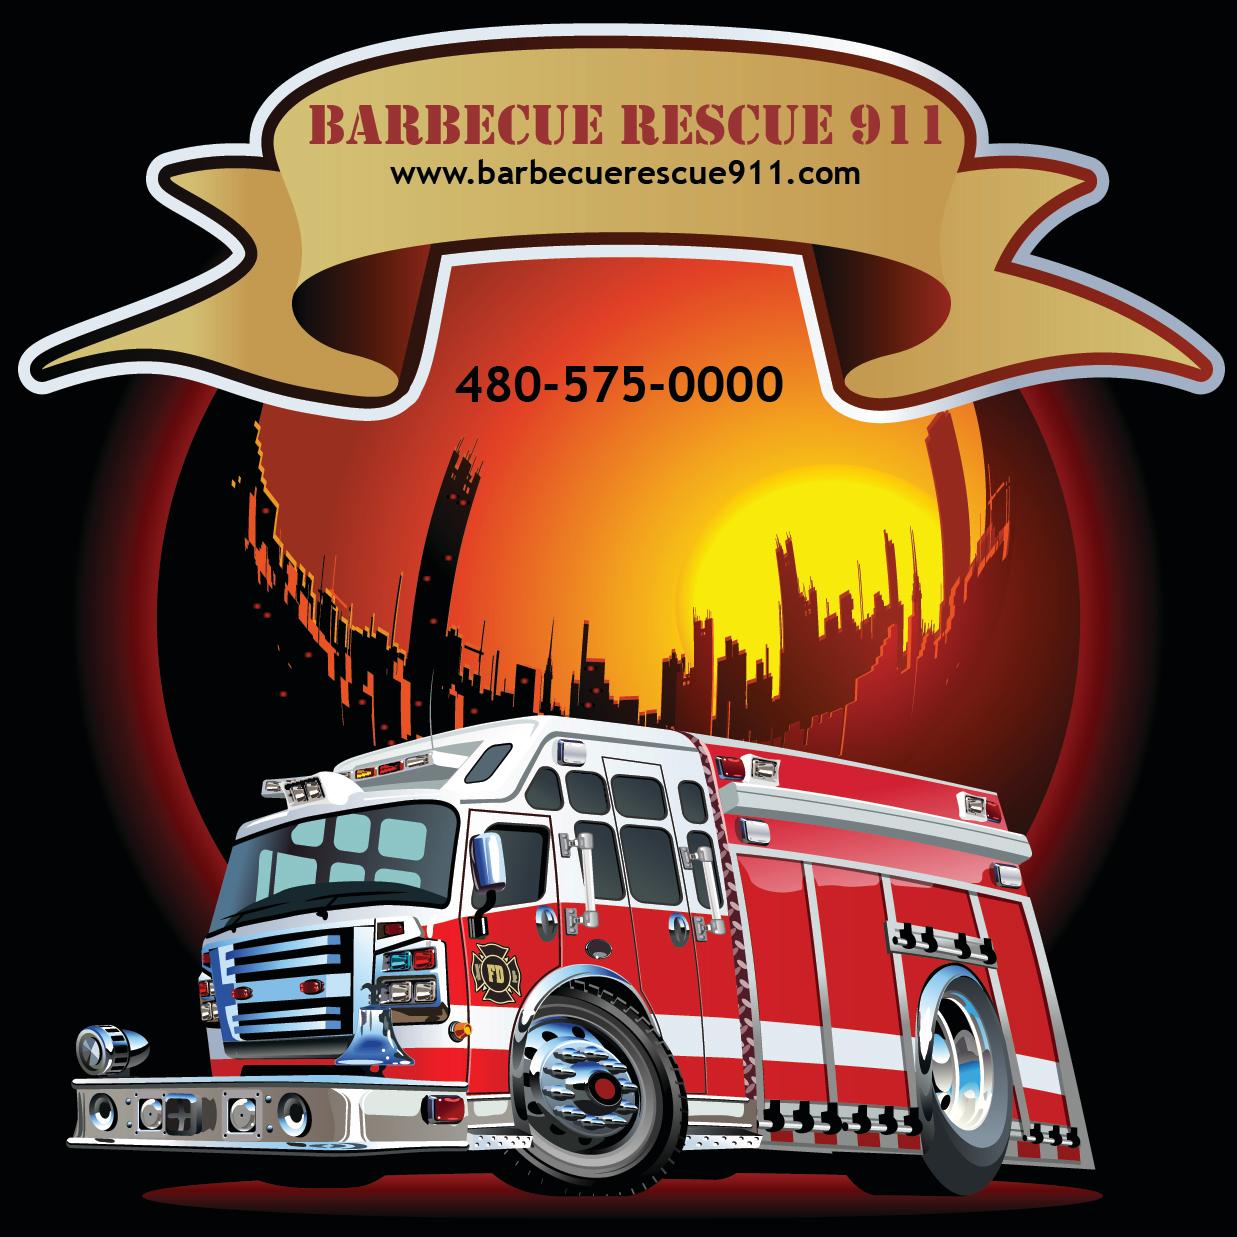 Barbecue Rescue 911 - Cave Creek, AZ 85331 - (480)575-0000 | ShowMeLocal.com